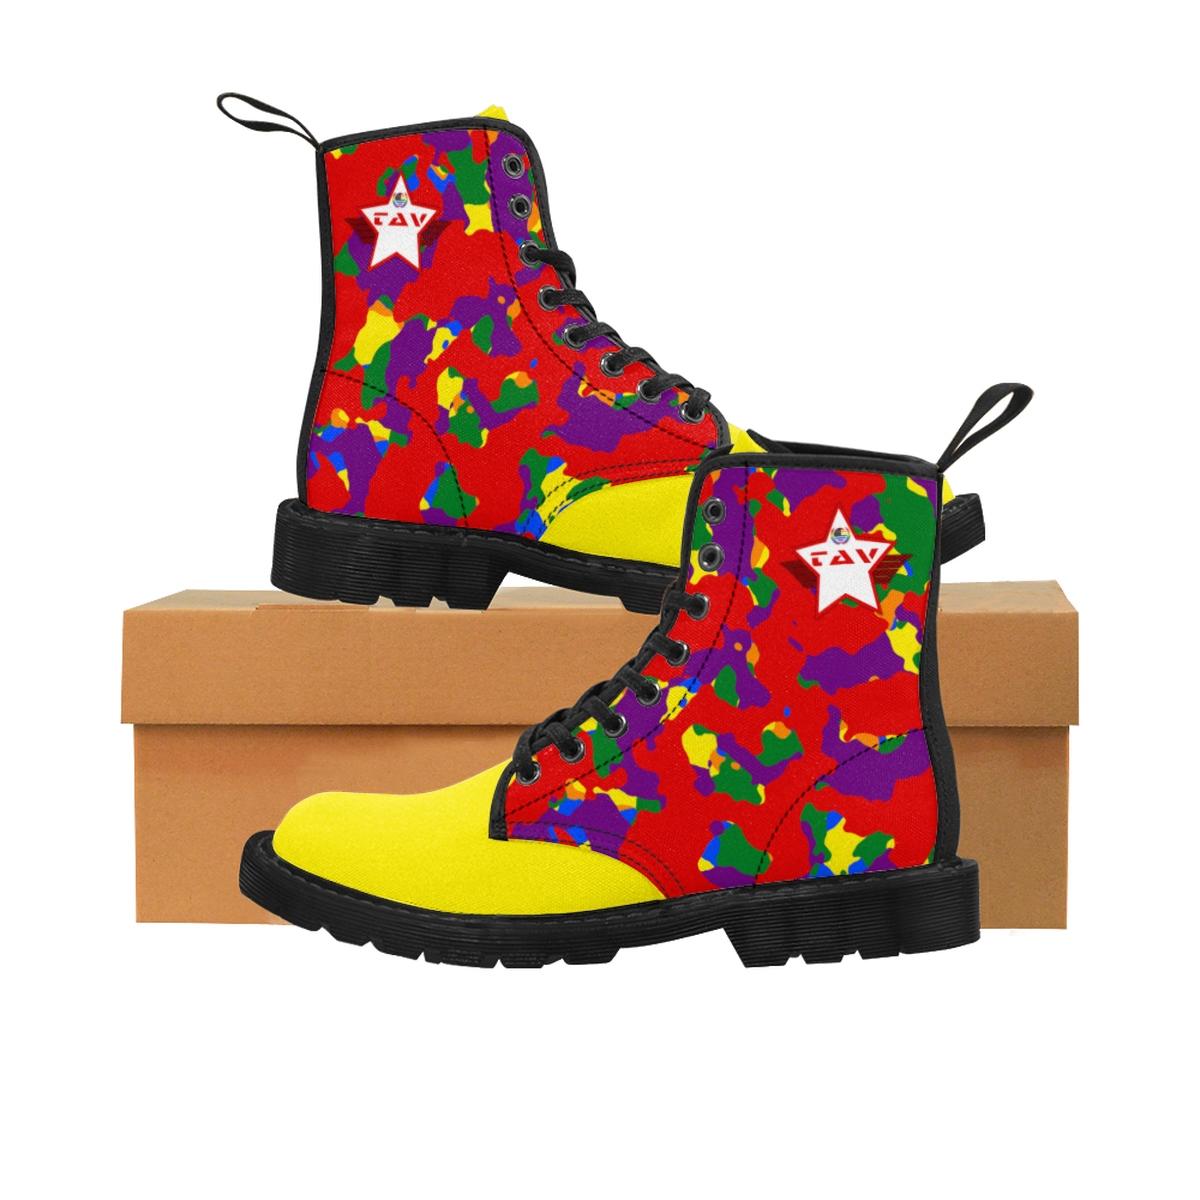 Women's Partial Pride Red Camo & Yellow Canvas Boots – Red & White TAV Pride Shield